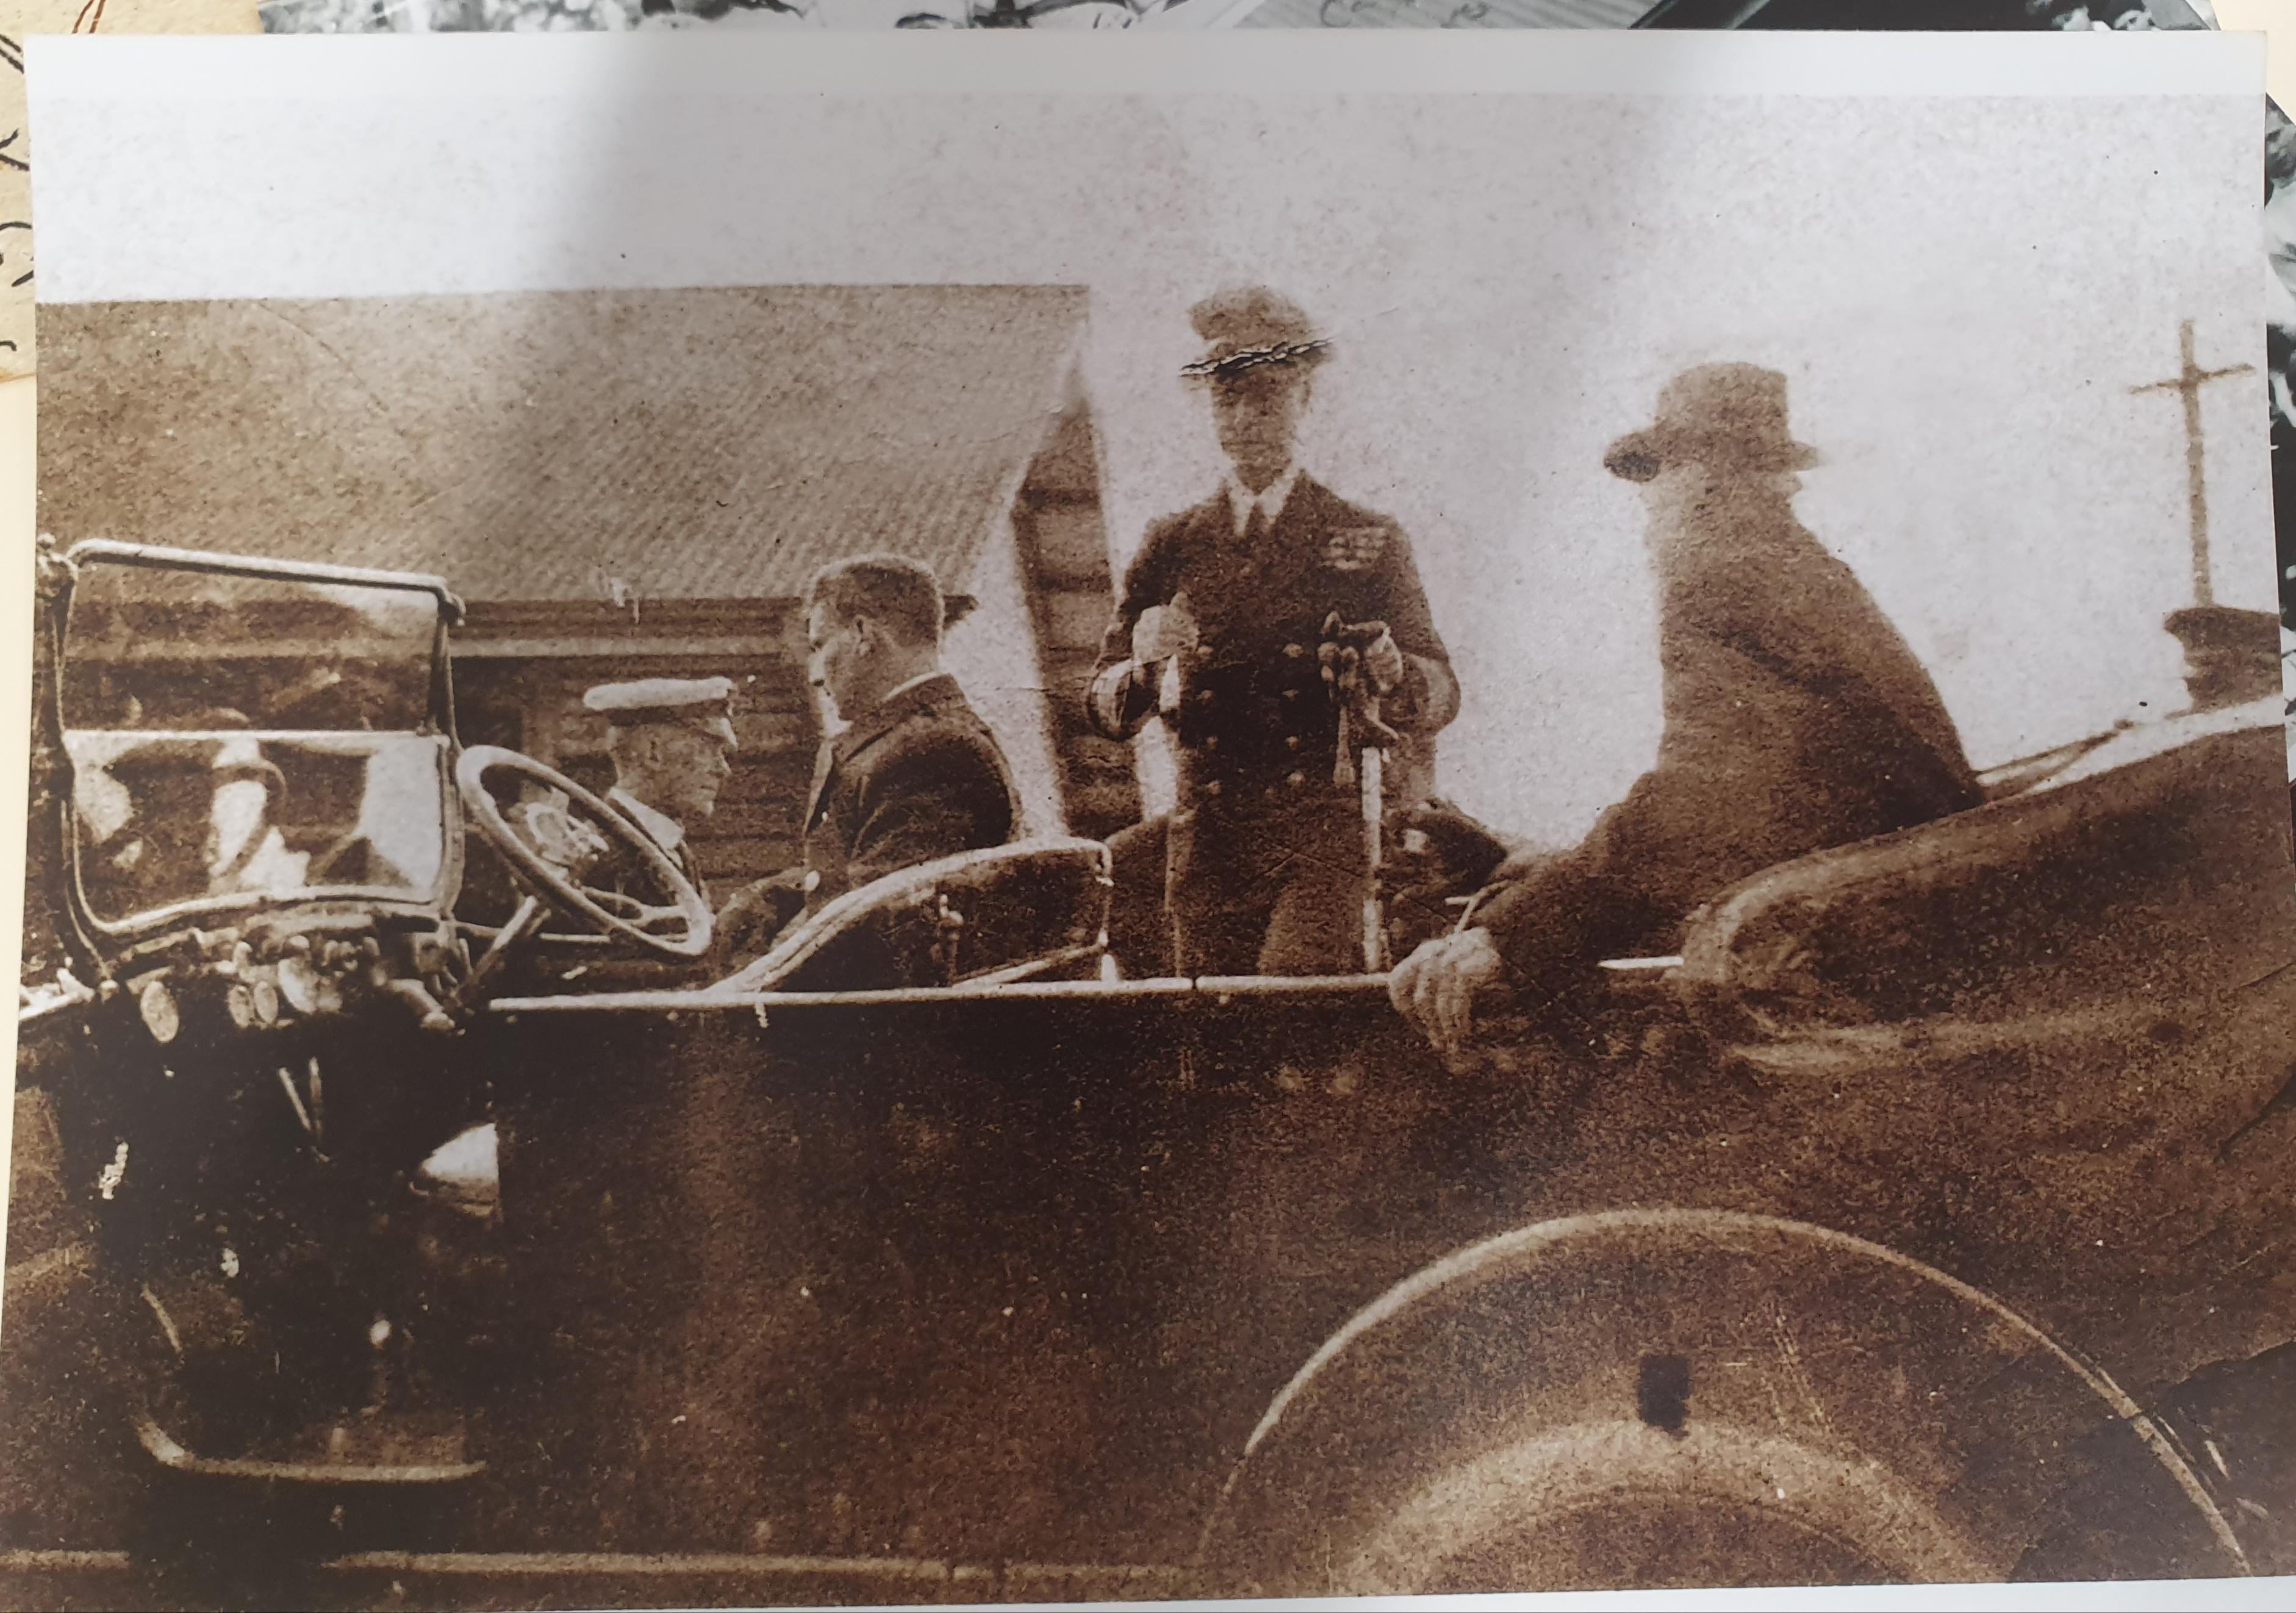 Prince of Wales visits, June 1920